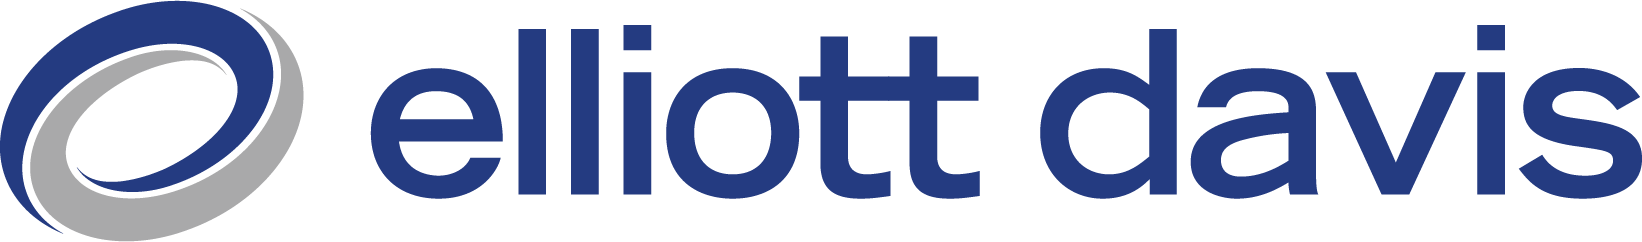 Elliott Davis Logo - Blue Gray.png